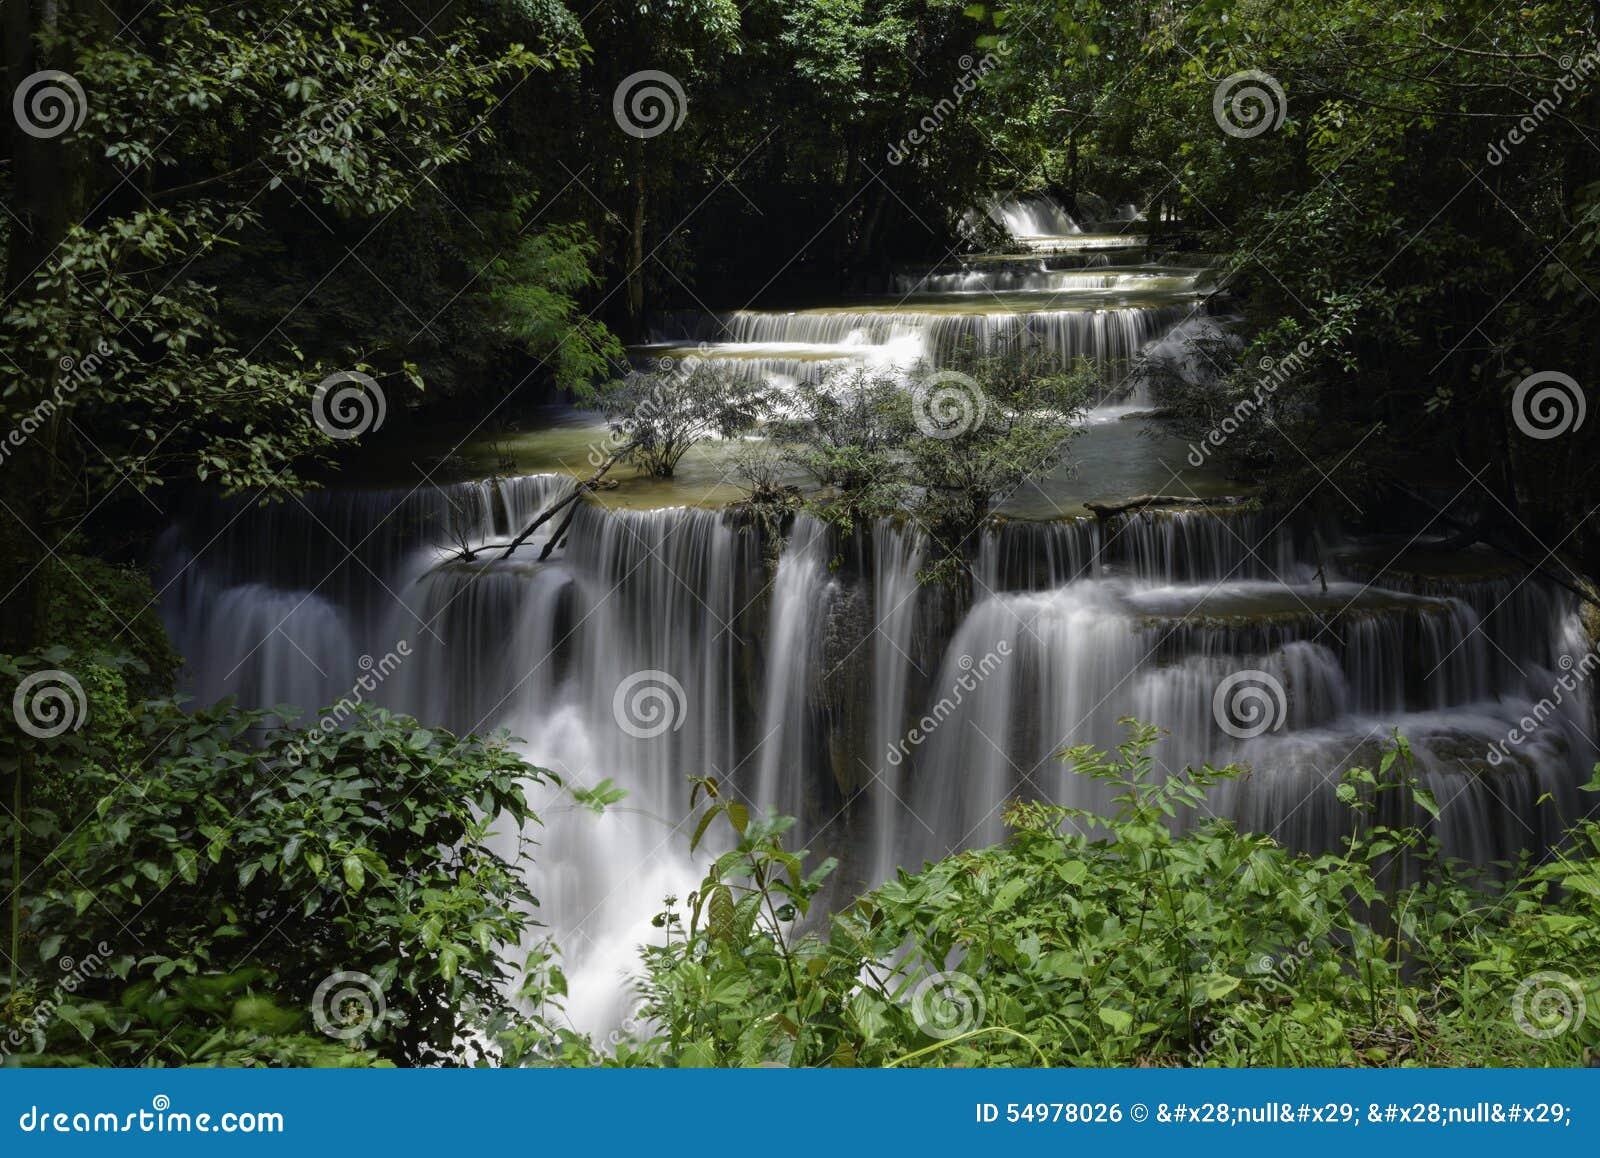 Niveau principal de Huai Mae Kamin Waterfall dans la province de Kanchanaburi, Thaïlande